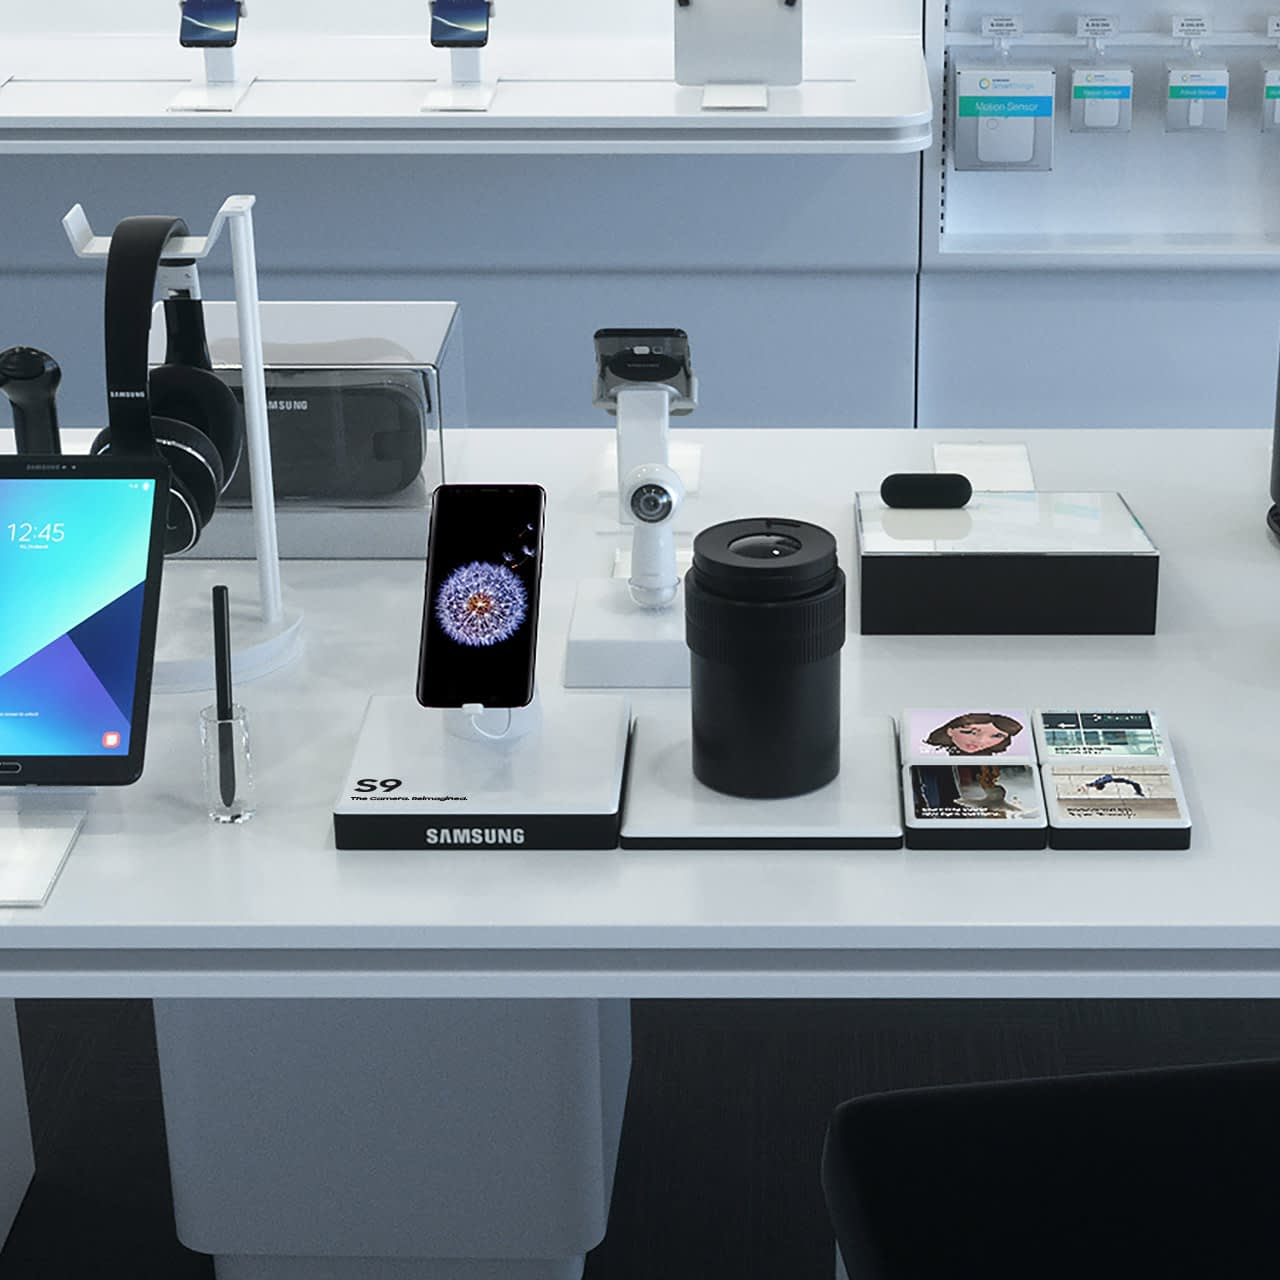 samsung retail in-store 3d rendering